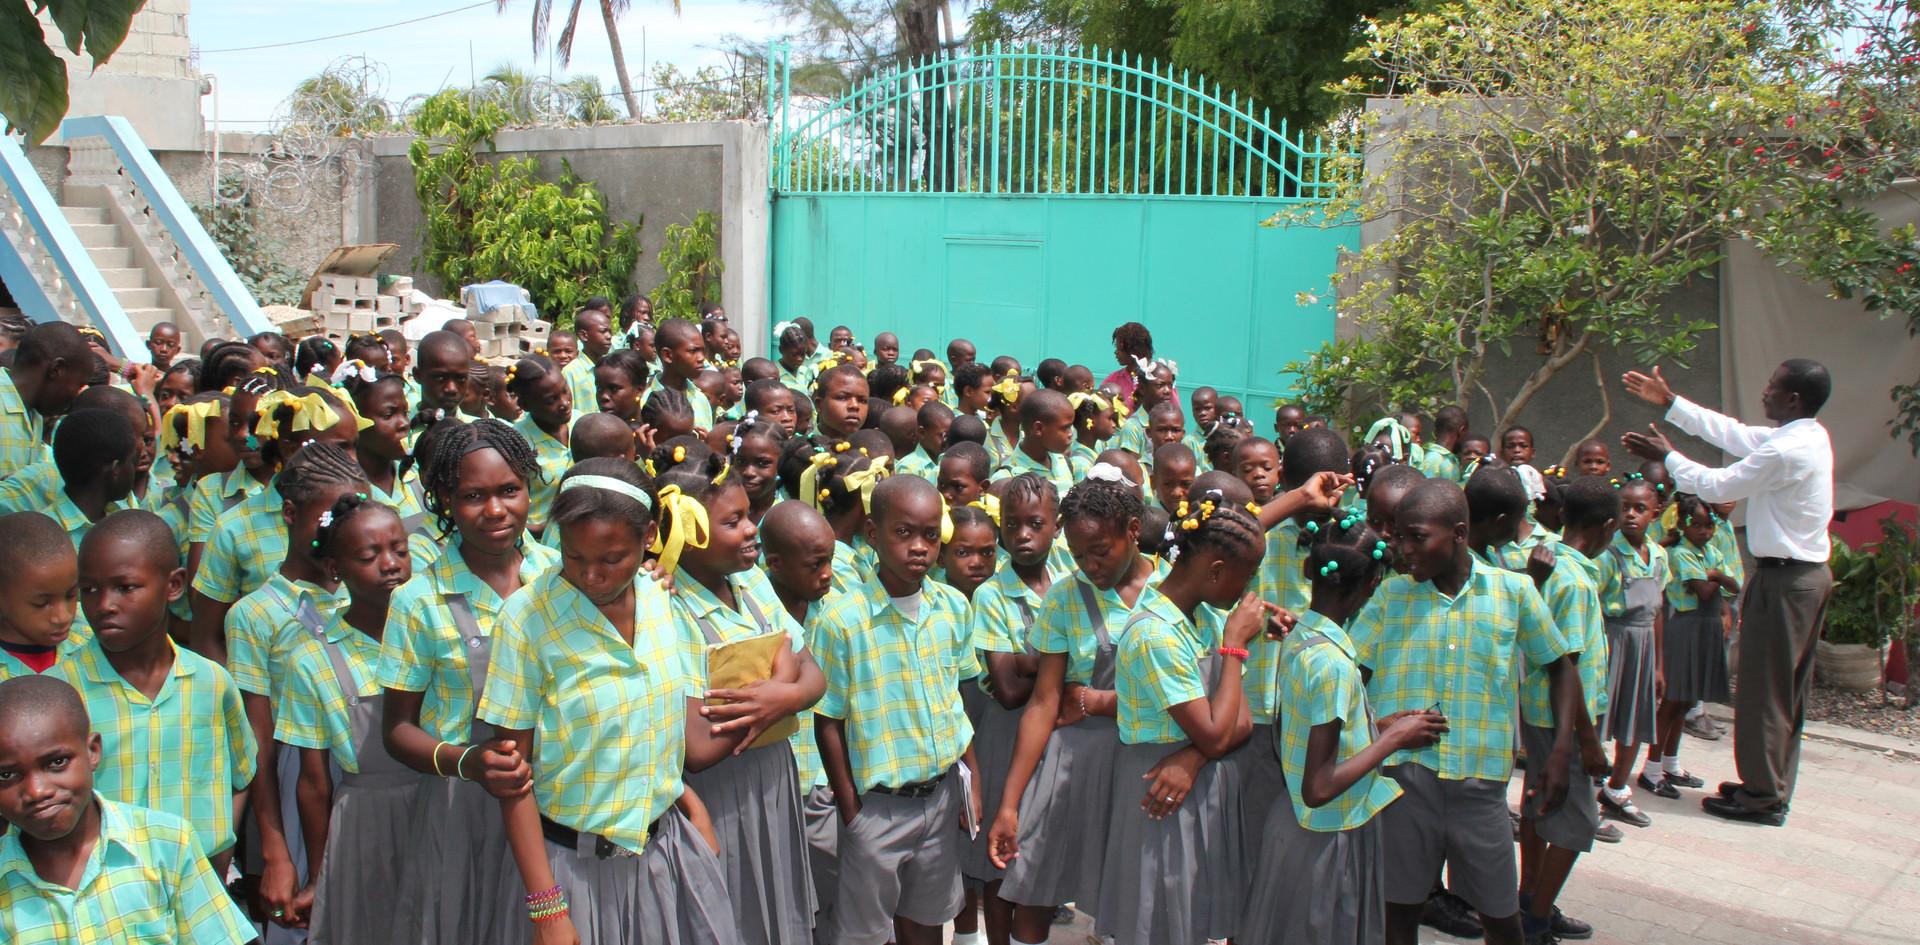 Ecole à Port-au-Prince